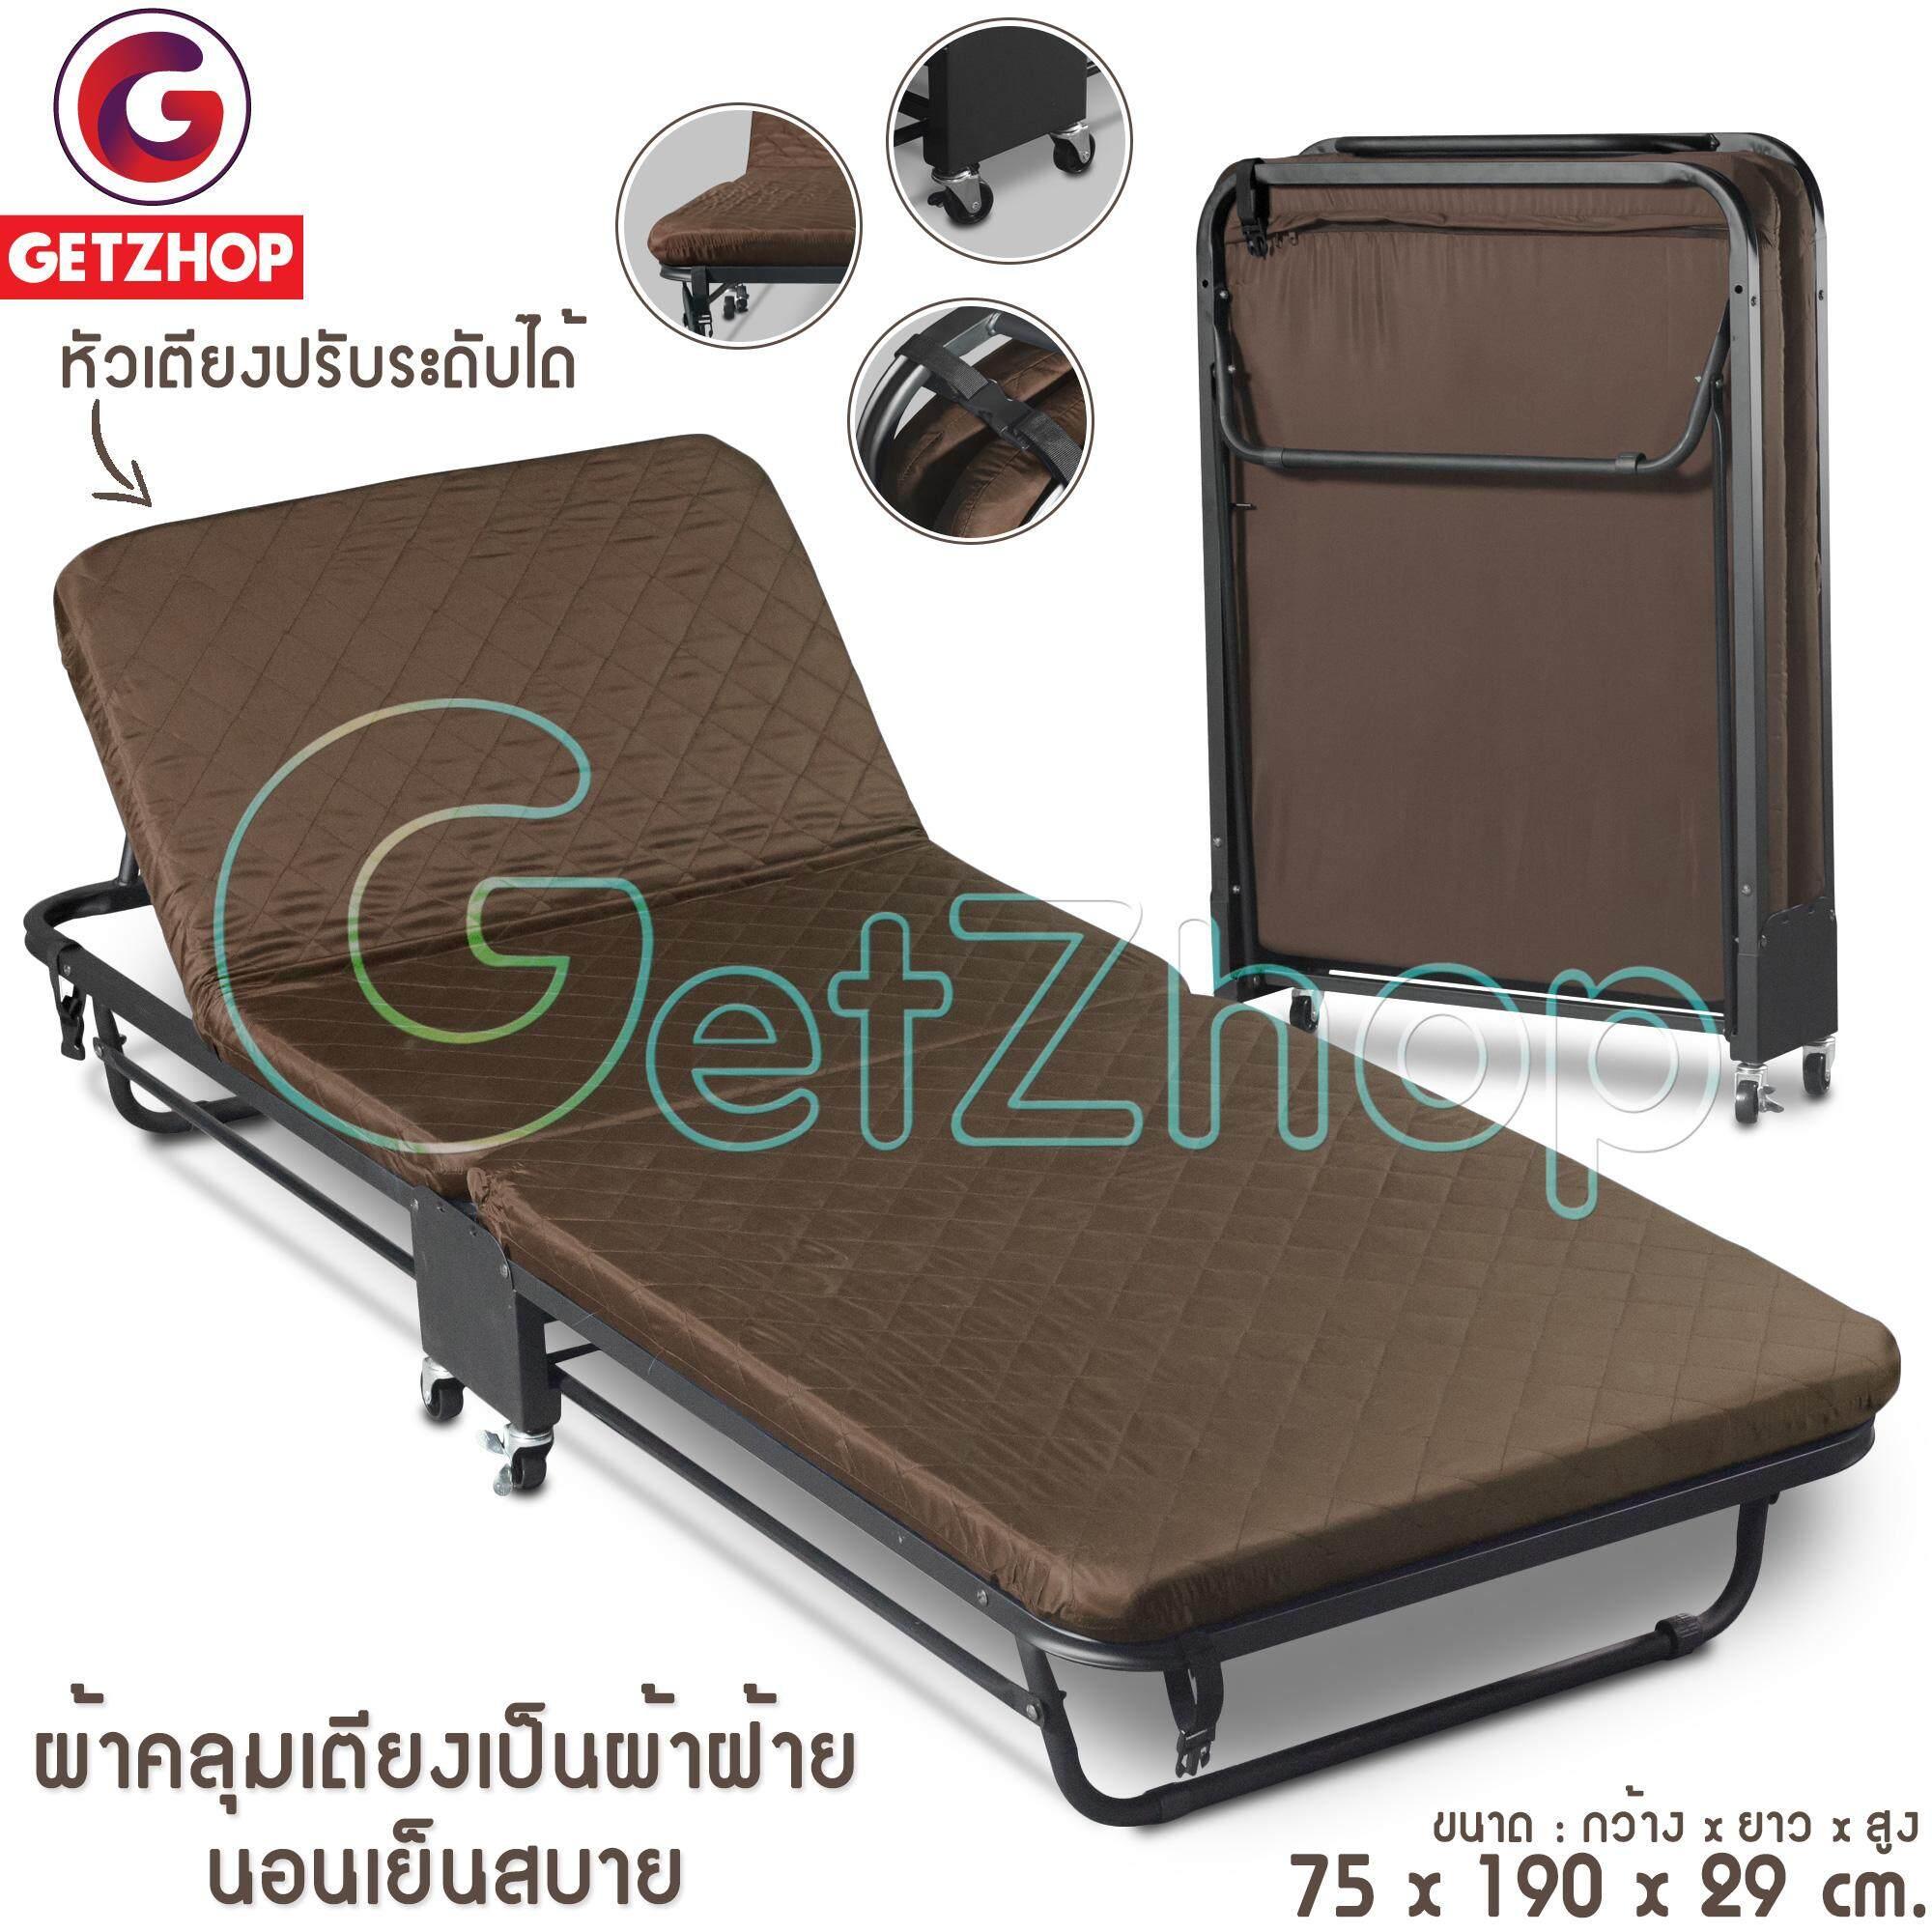 Getzhop เตียงเสริมพับได้ พร้อมเบาะรองนอน เตียงเหล็ก เตียงผู้ป่วย เตียงพับมีล้อ รุ่น 2107 ขนาด 75x190x29 Cm..